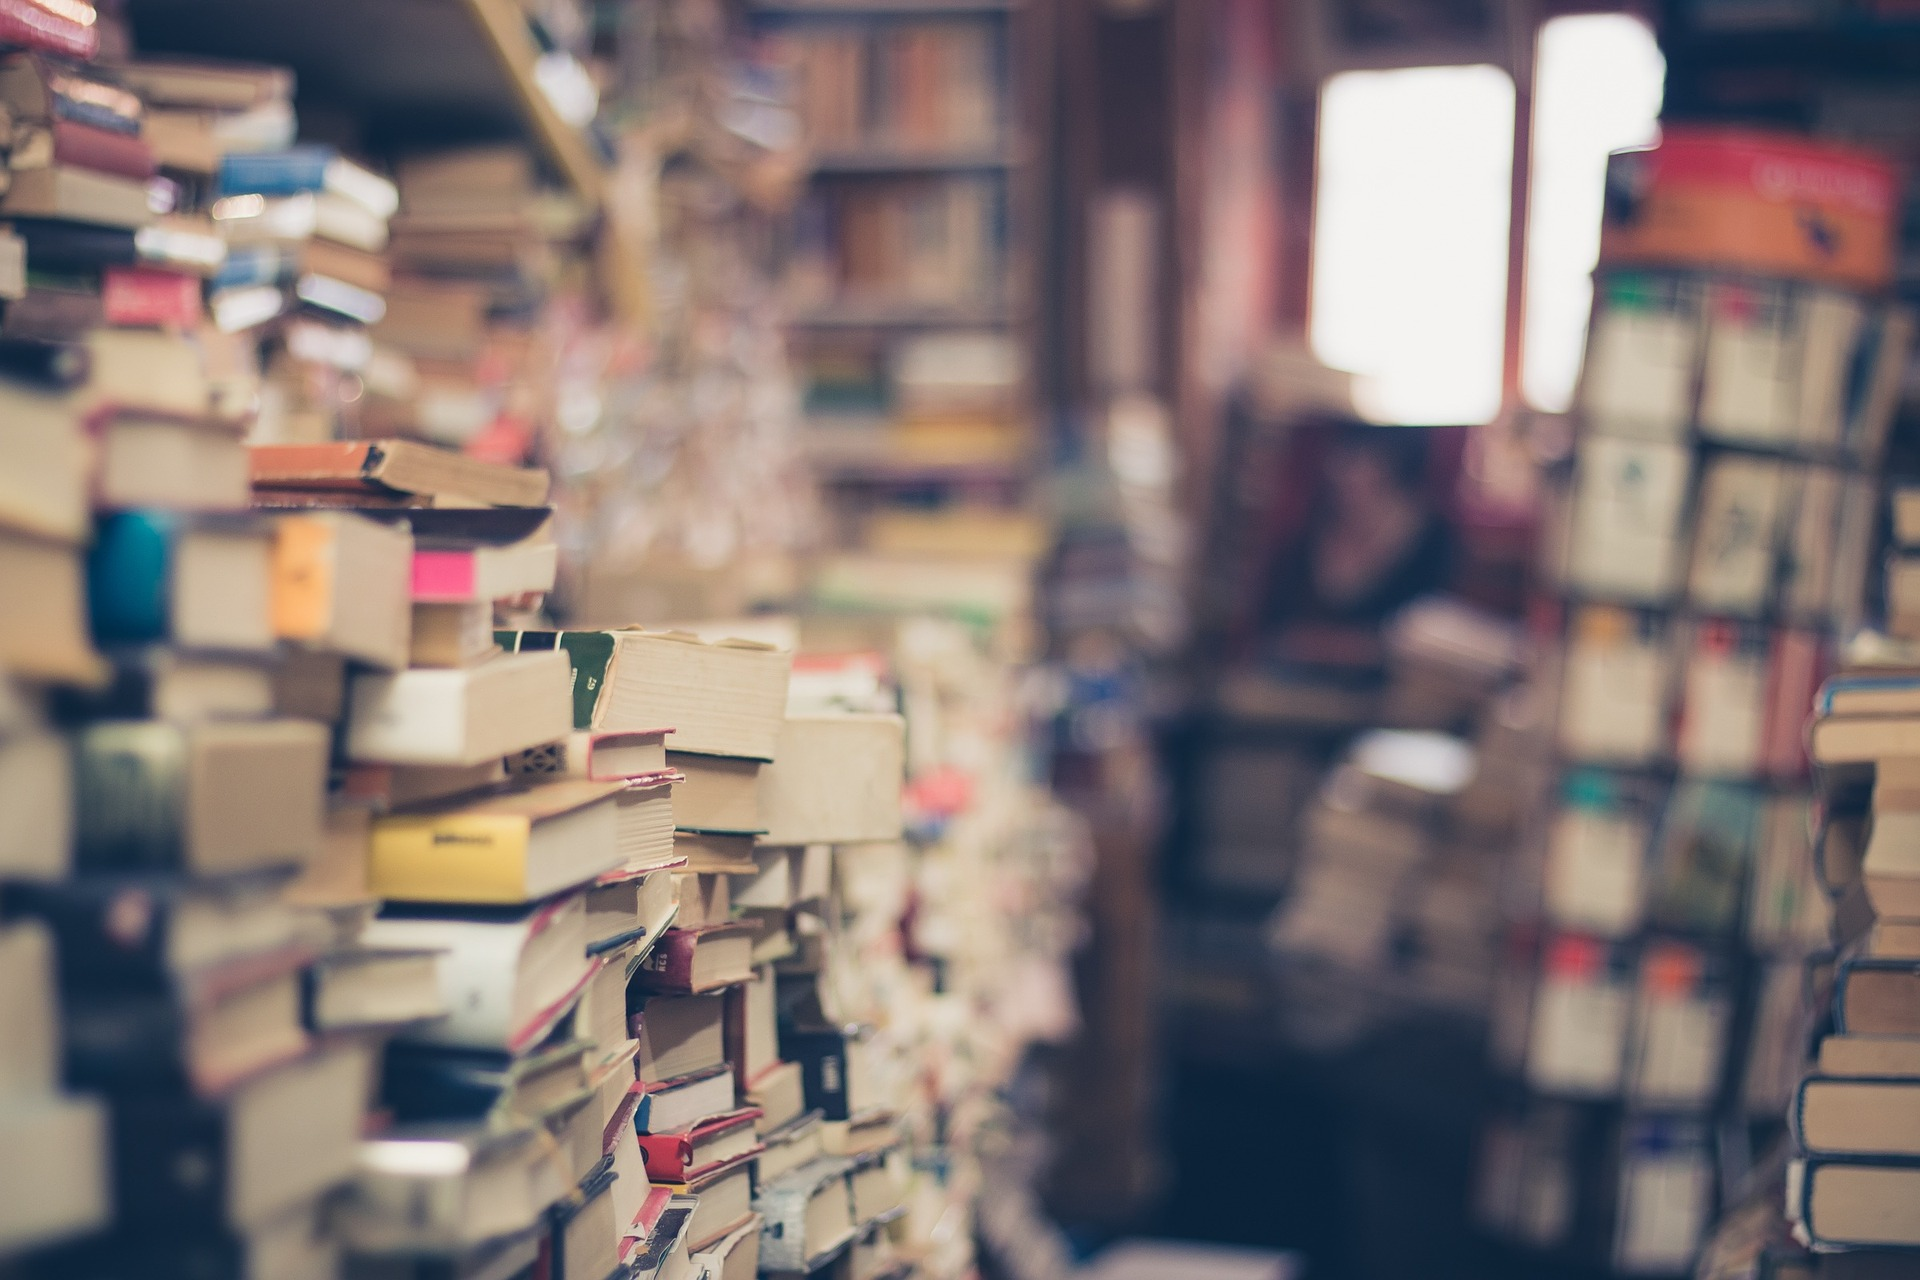 Bücherstapel | Okt - Nov - Dez 2020